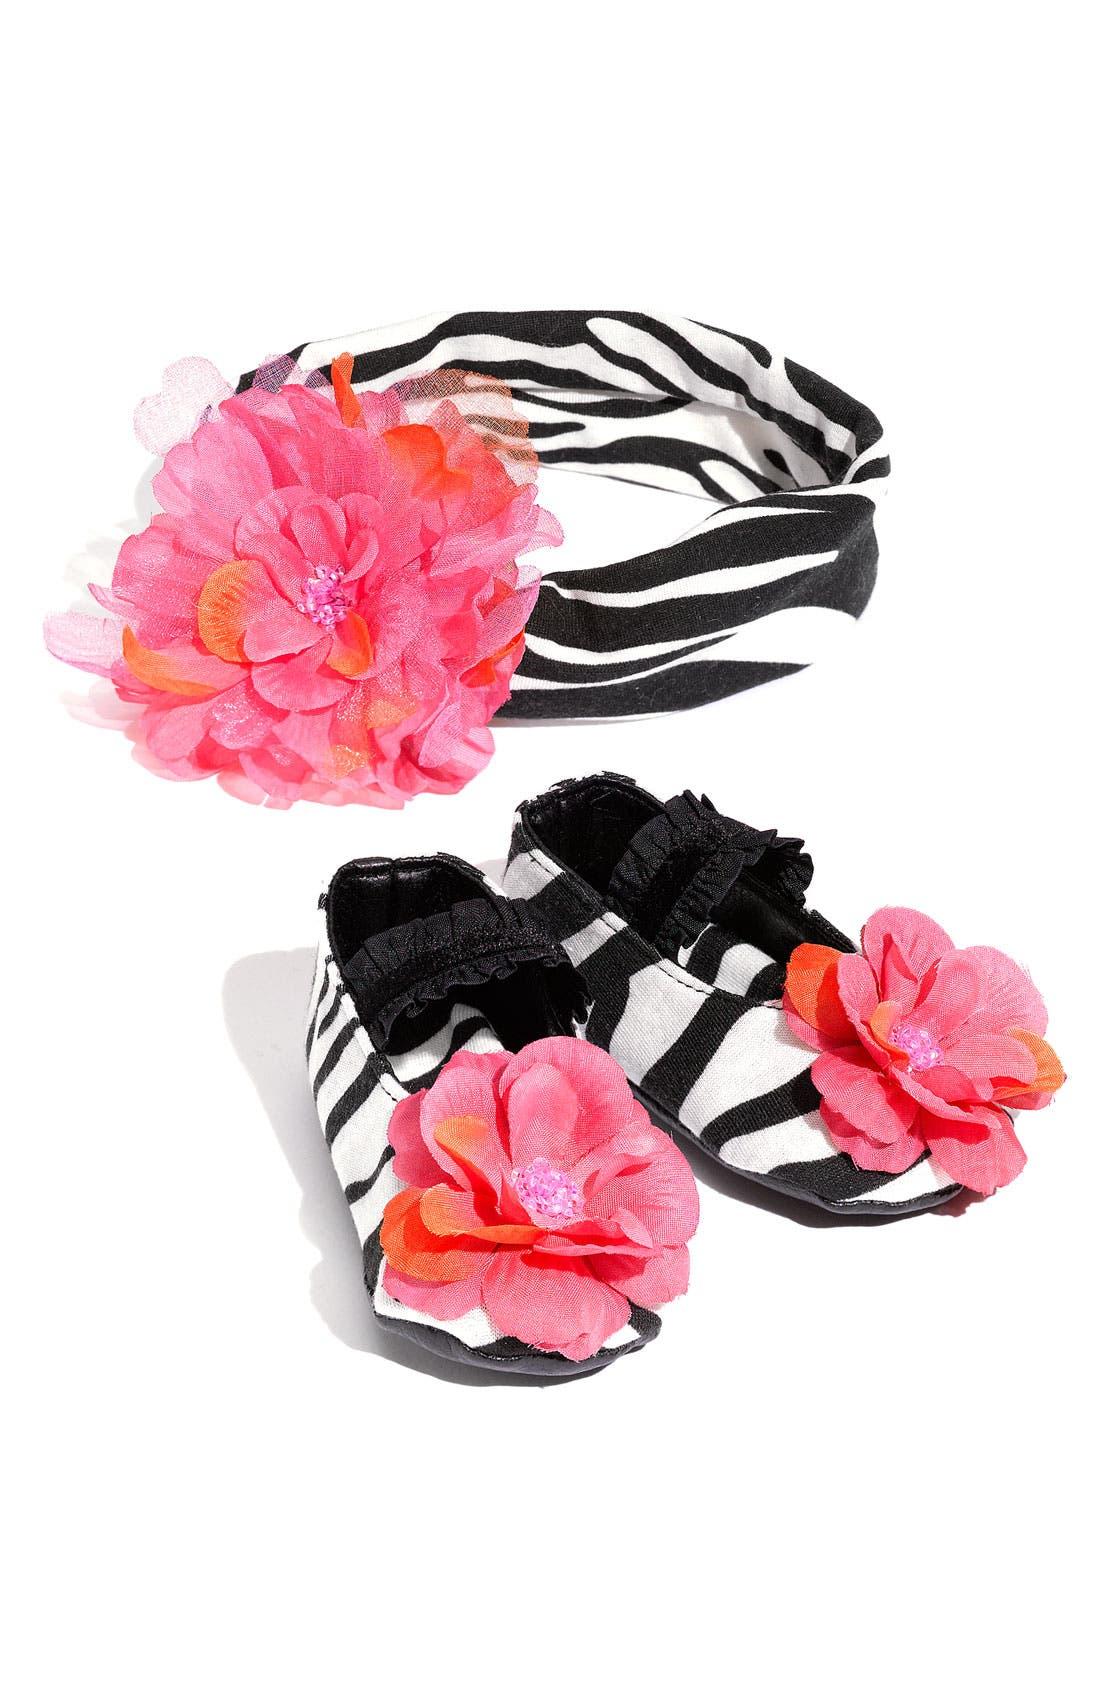 Main Image - PLH Bows & Laces Animal Print Shoes & Headband Set (Baby)